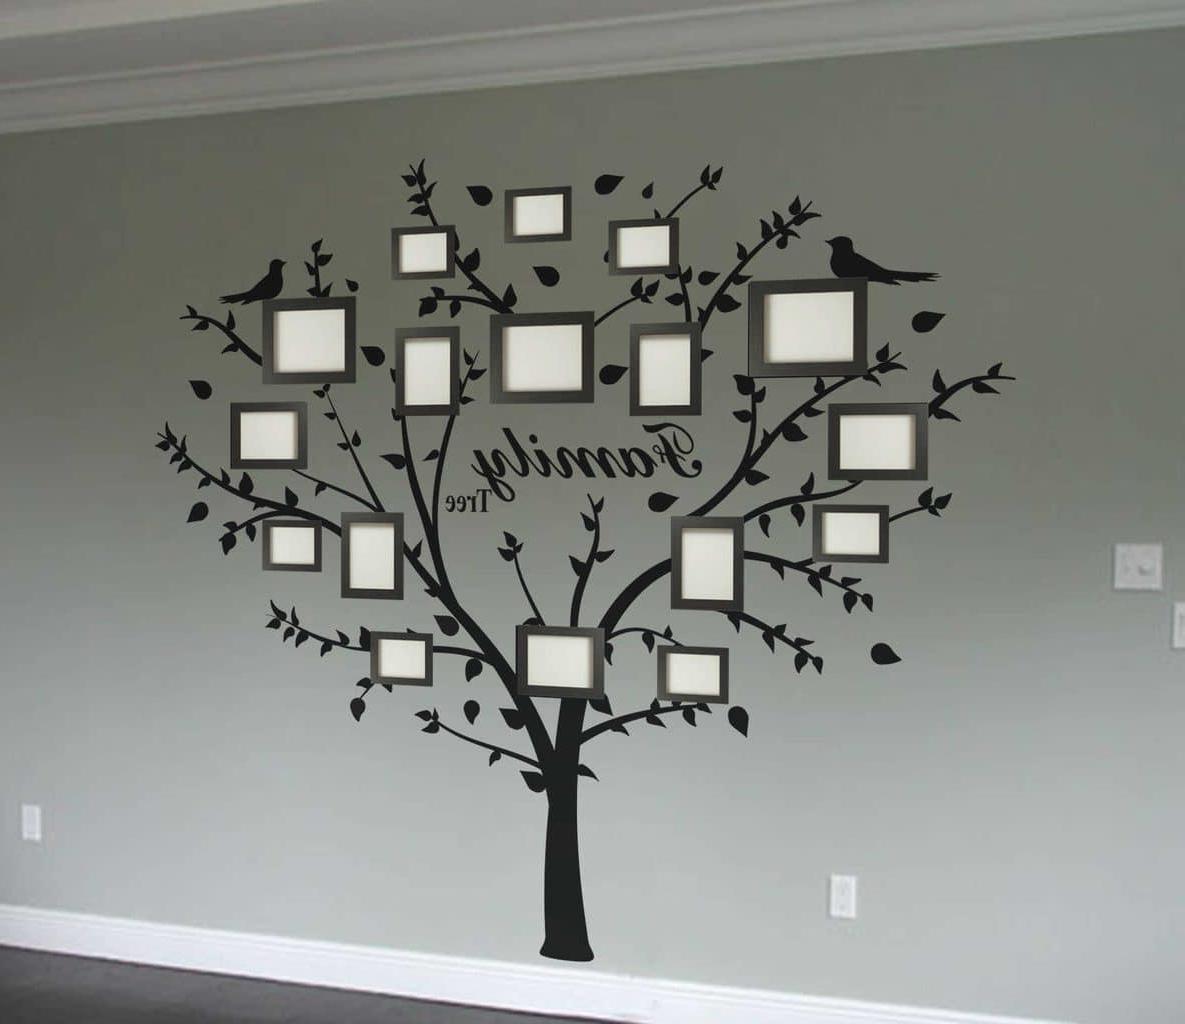 Fashionable Family Tree Wall Art Regarding Family Photo Tree Wall Decal Art Sticker – Luxury Mall (View 5 of 15)